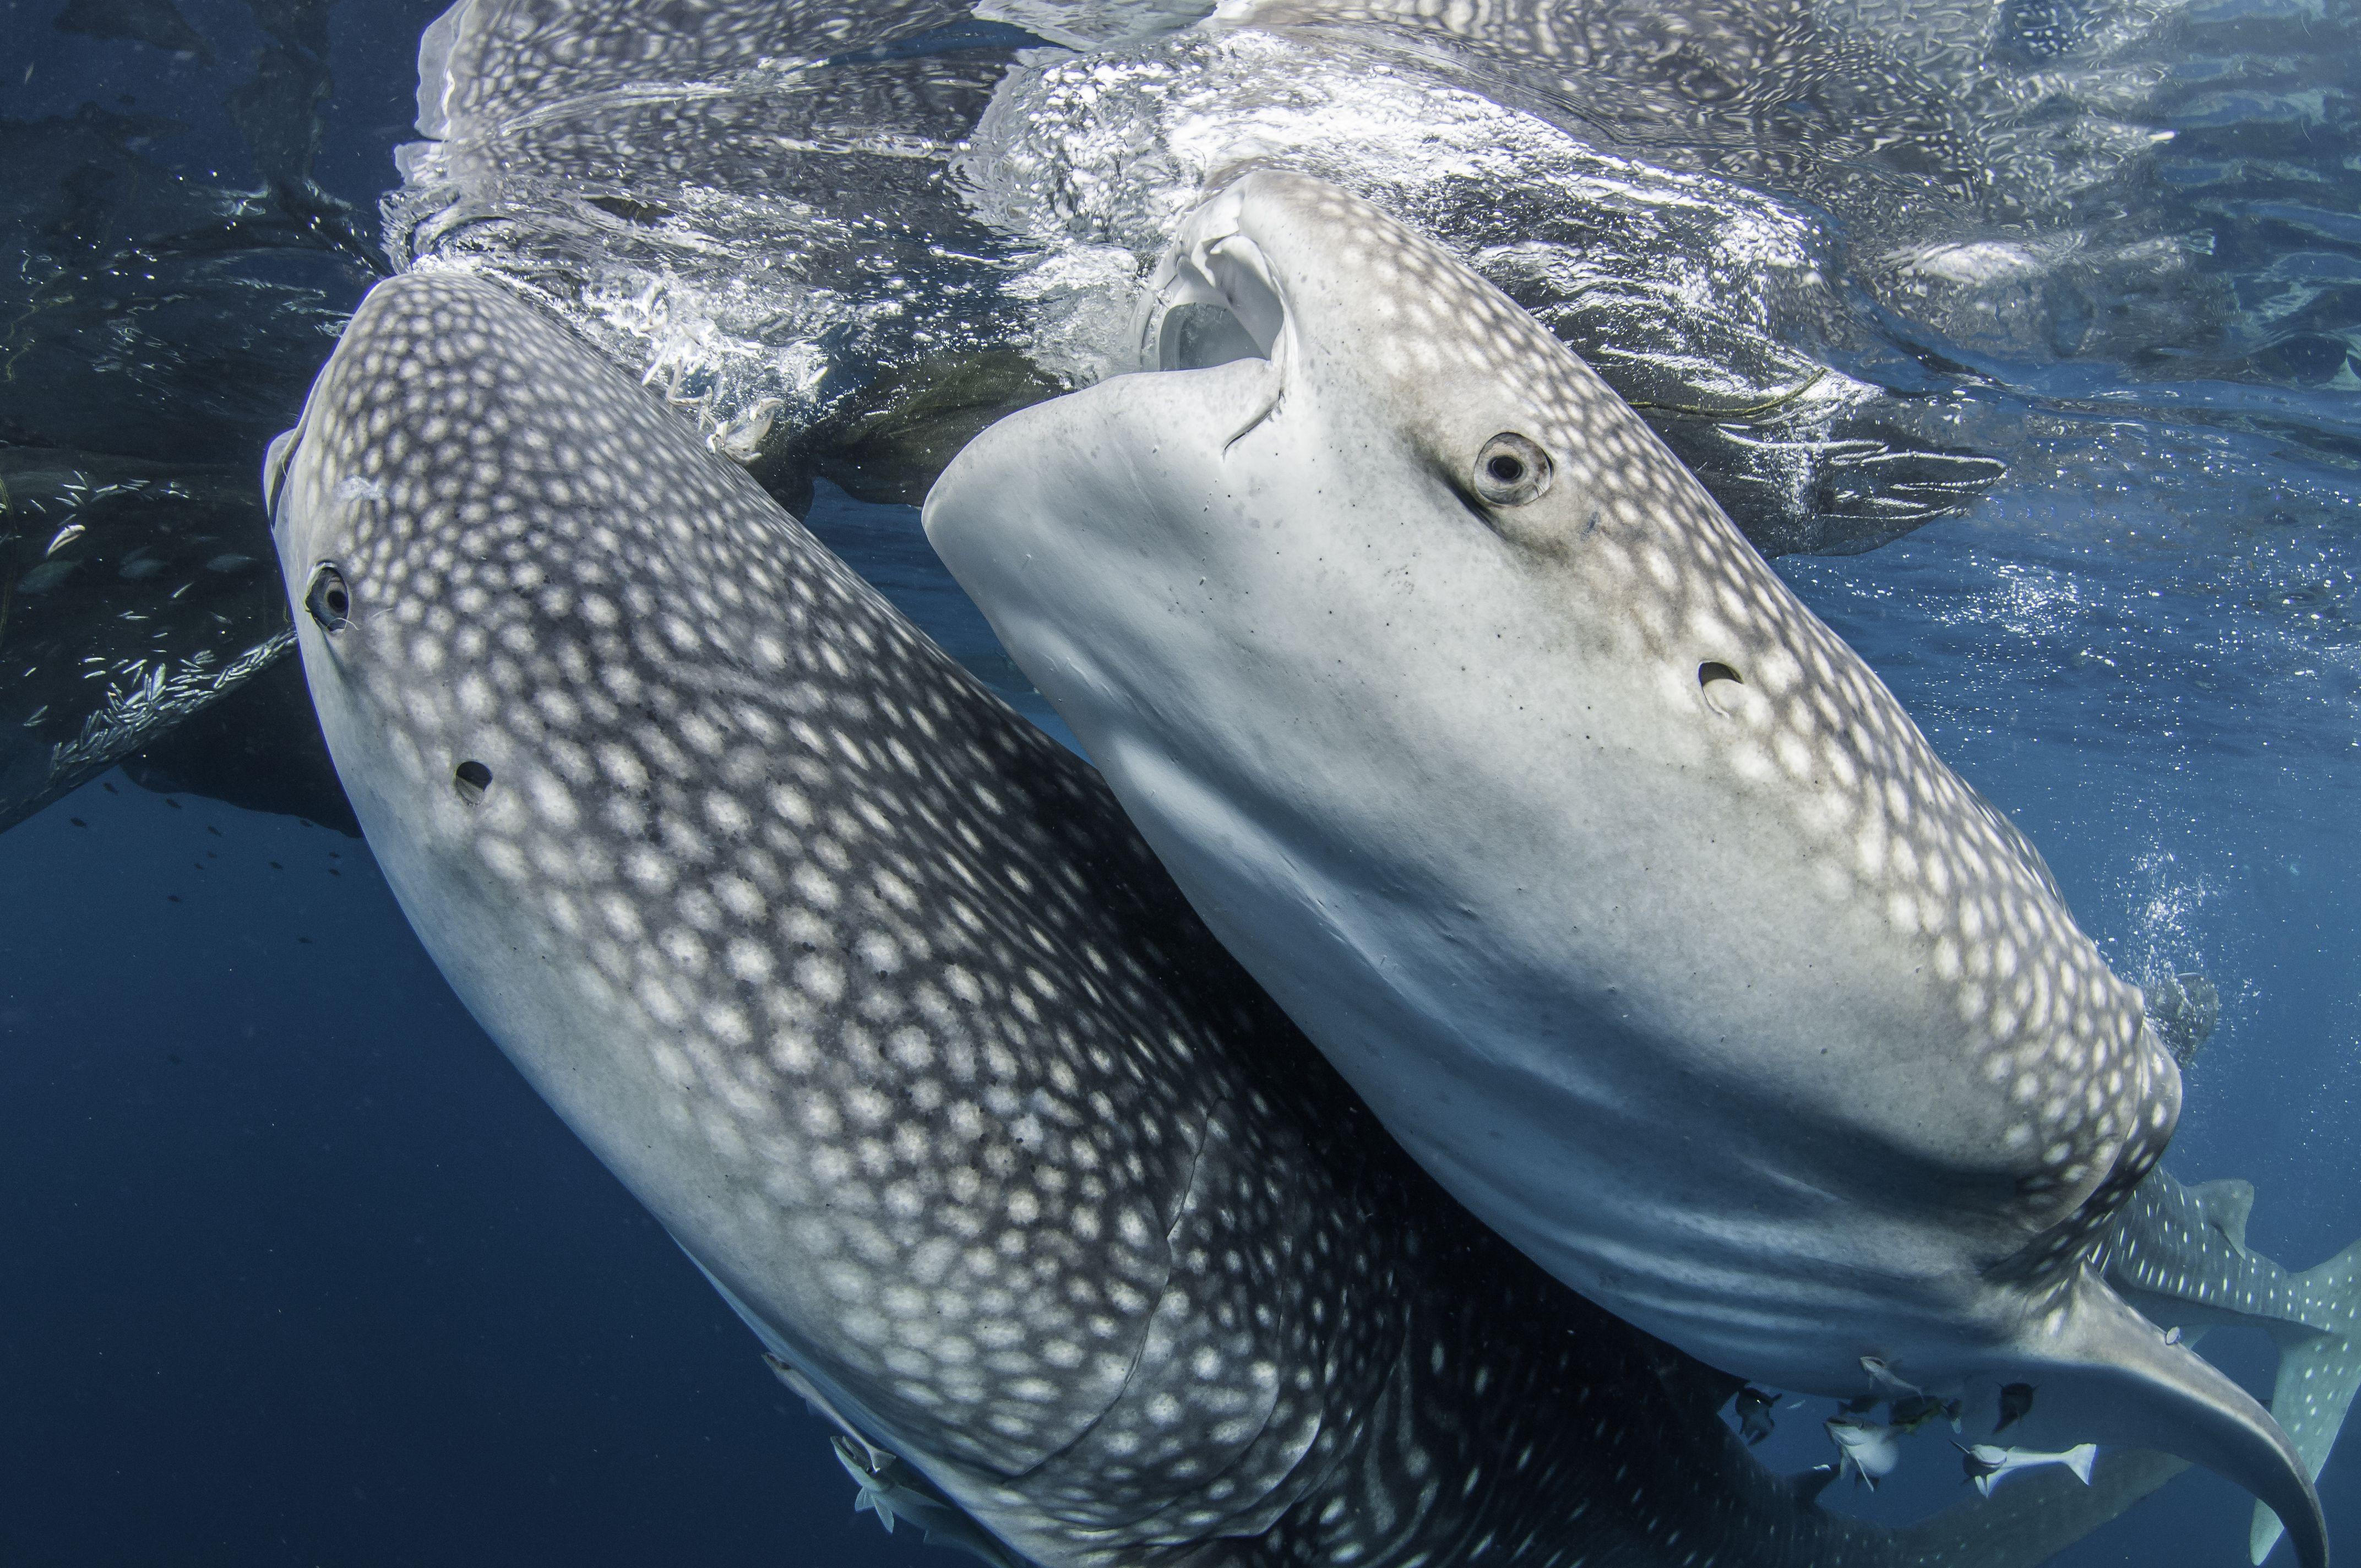 Two feeding whale sharks